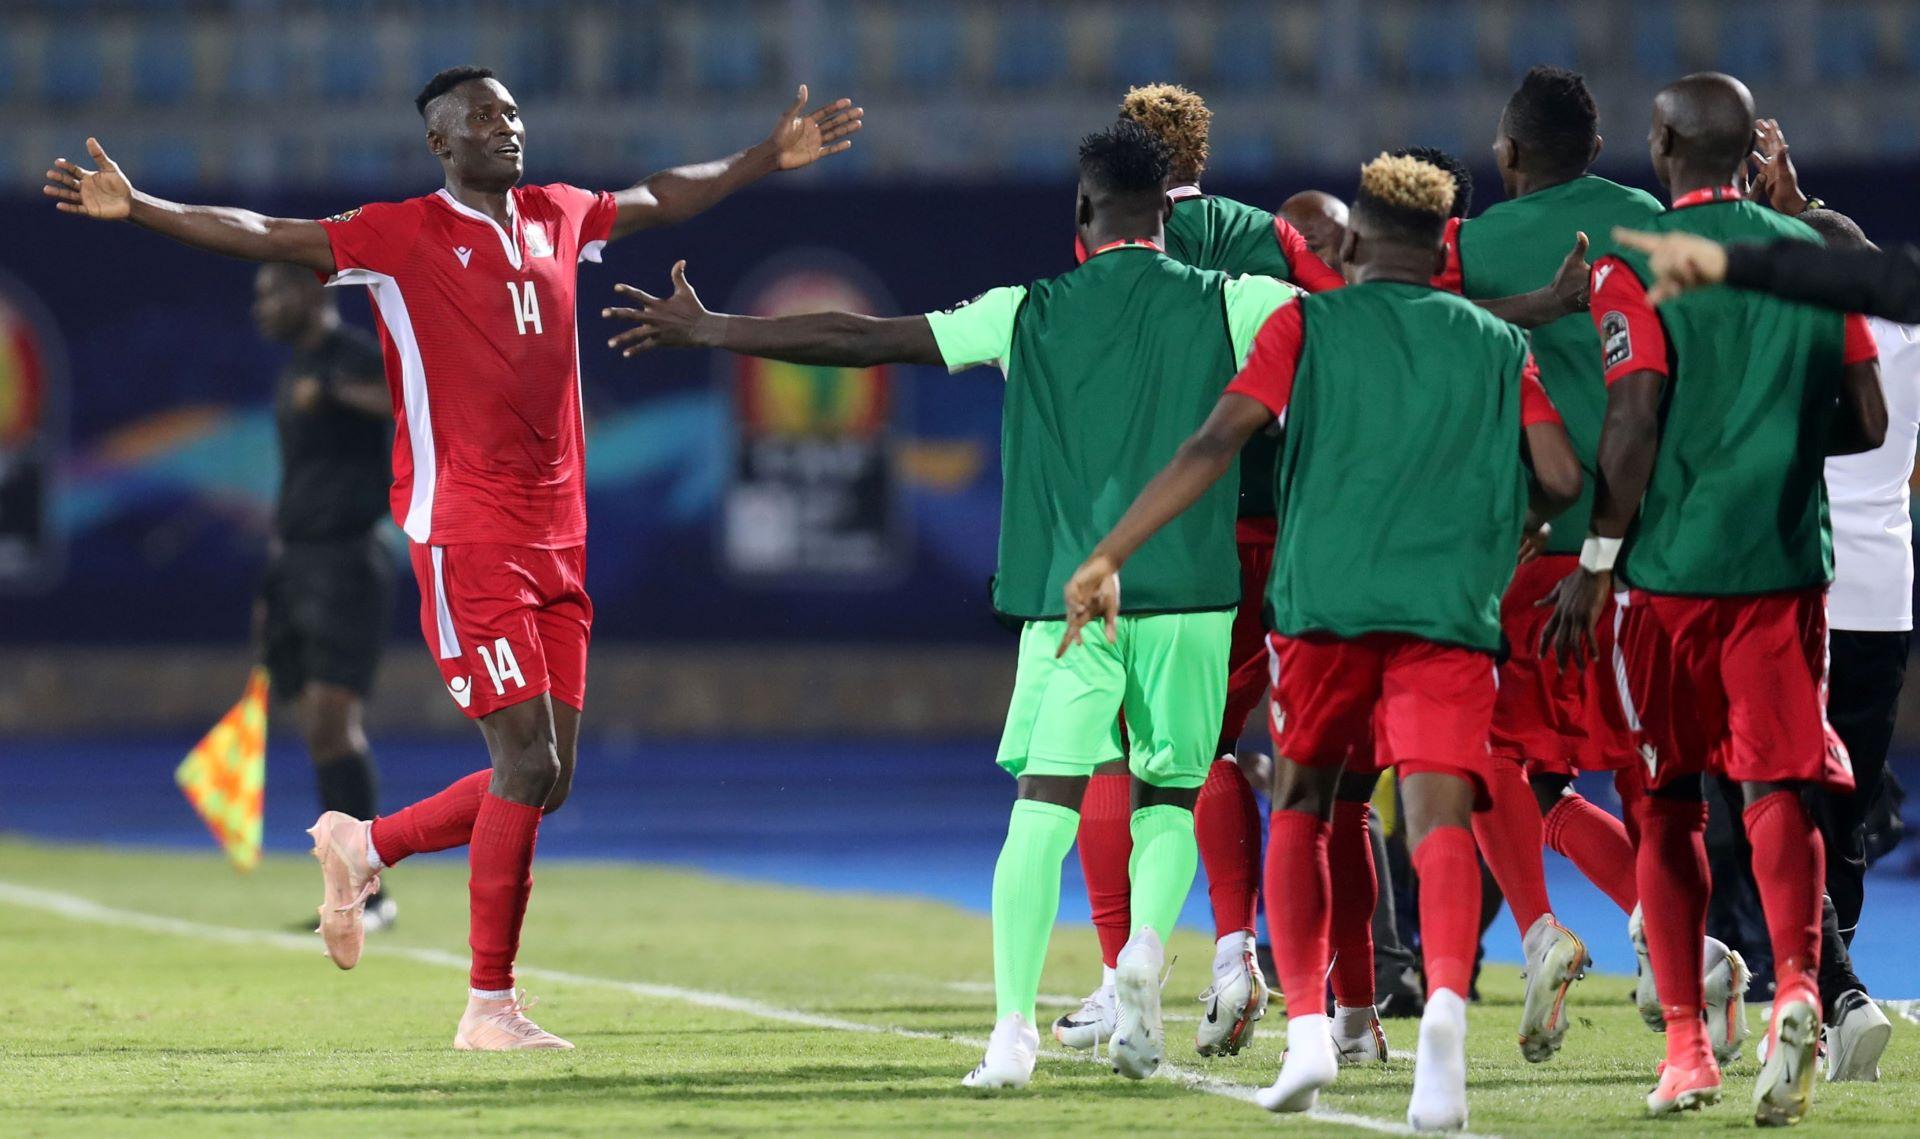 Michael Olunga Kenya v Tanzania Afcon 2019